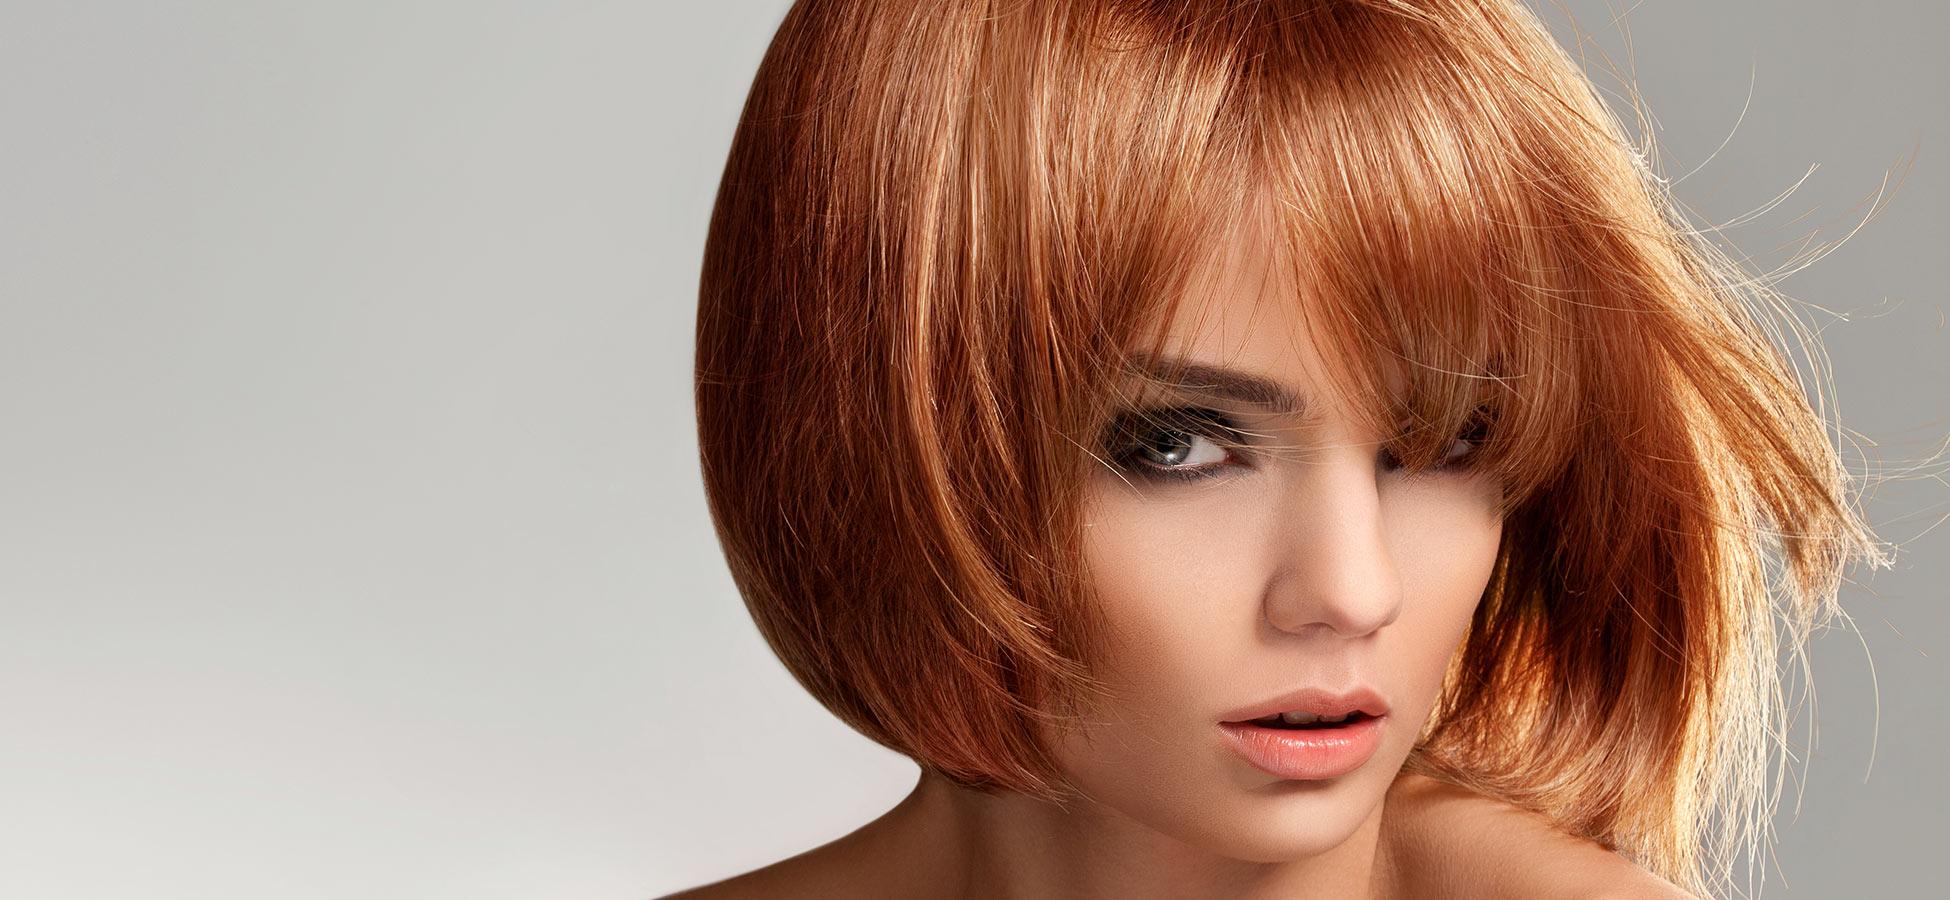 loi prestation de service dans la coiffure